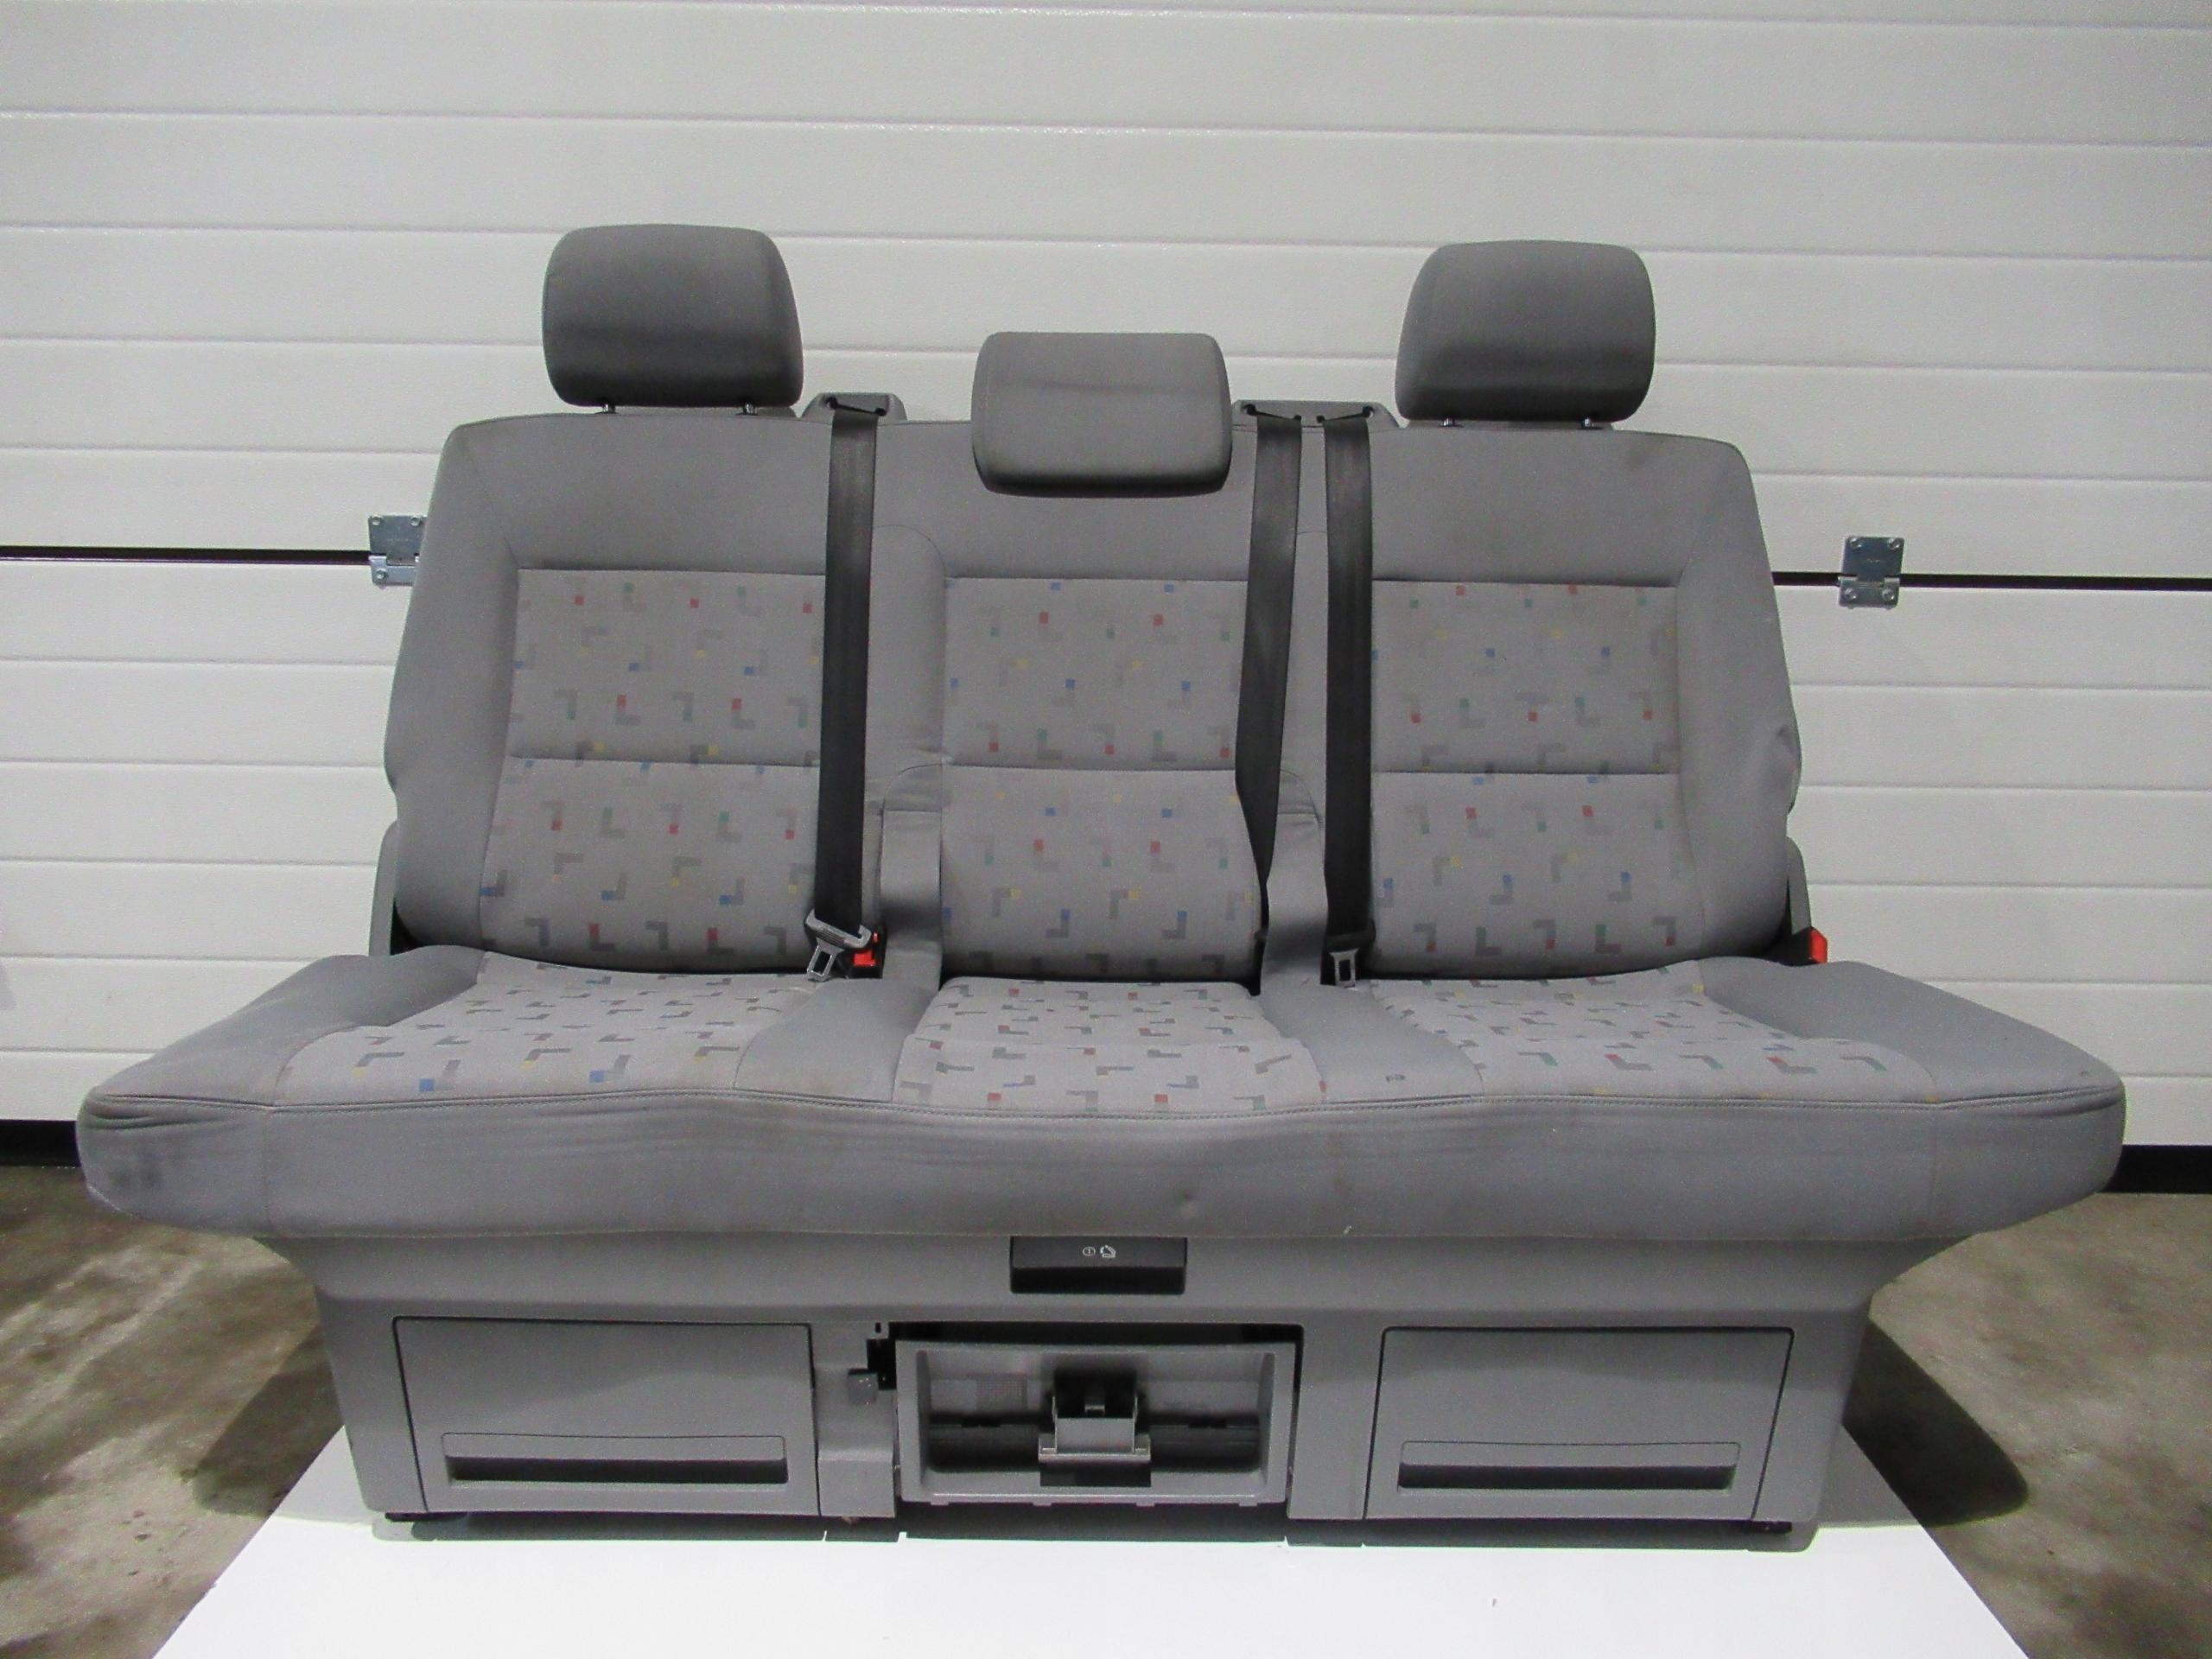 Купить третий ряд сидений на транспортер фольксваген транспортер с пробегом купить в костроме